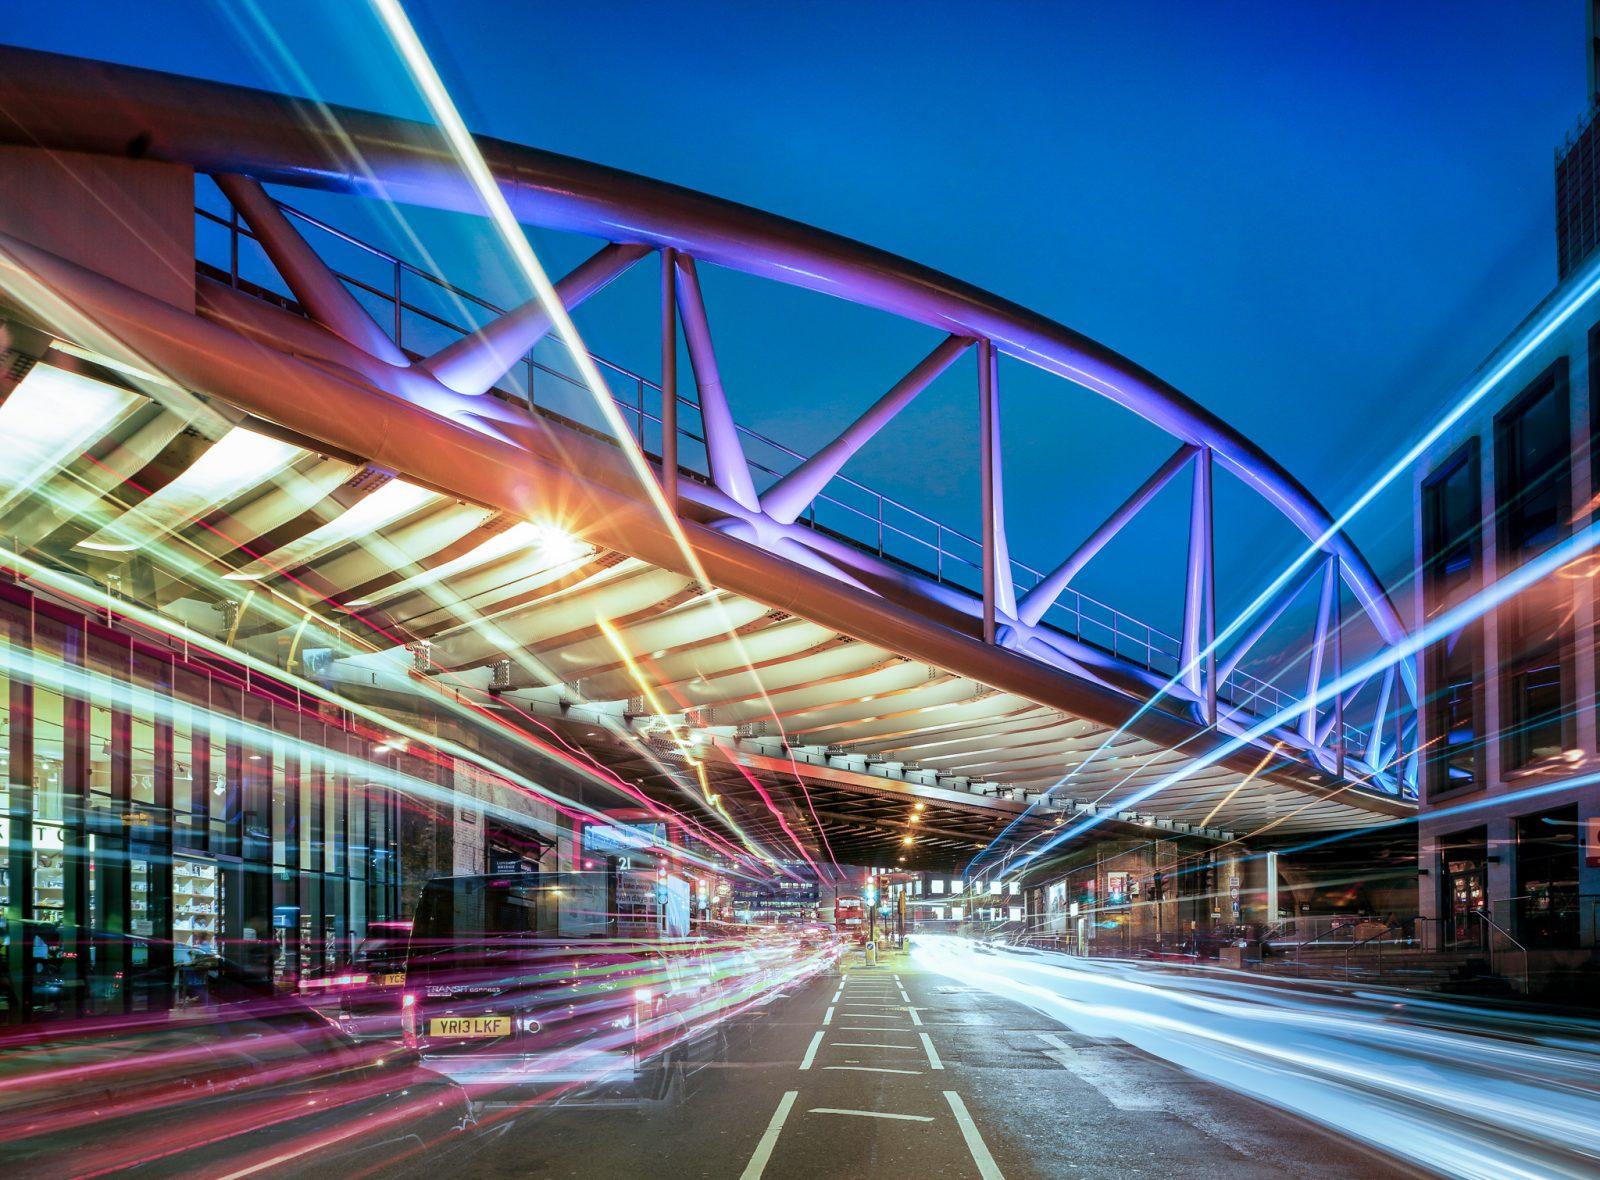 Borough Viaduct